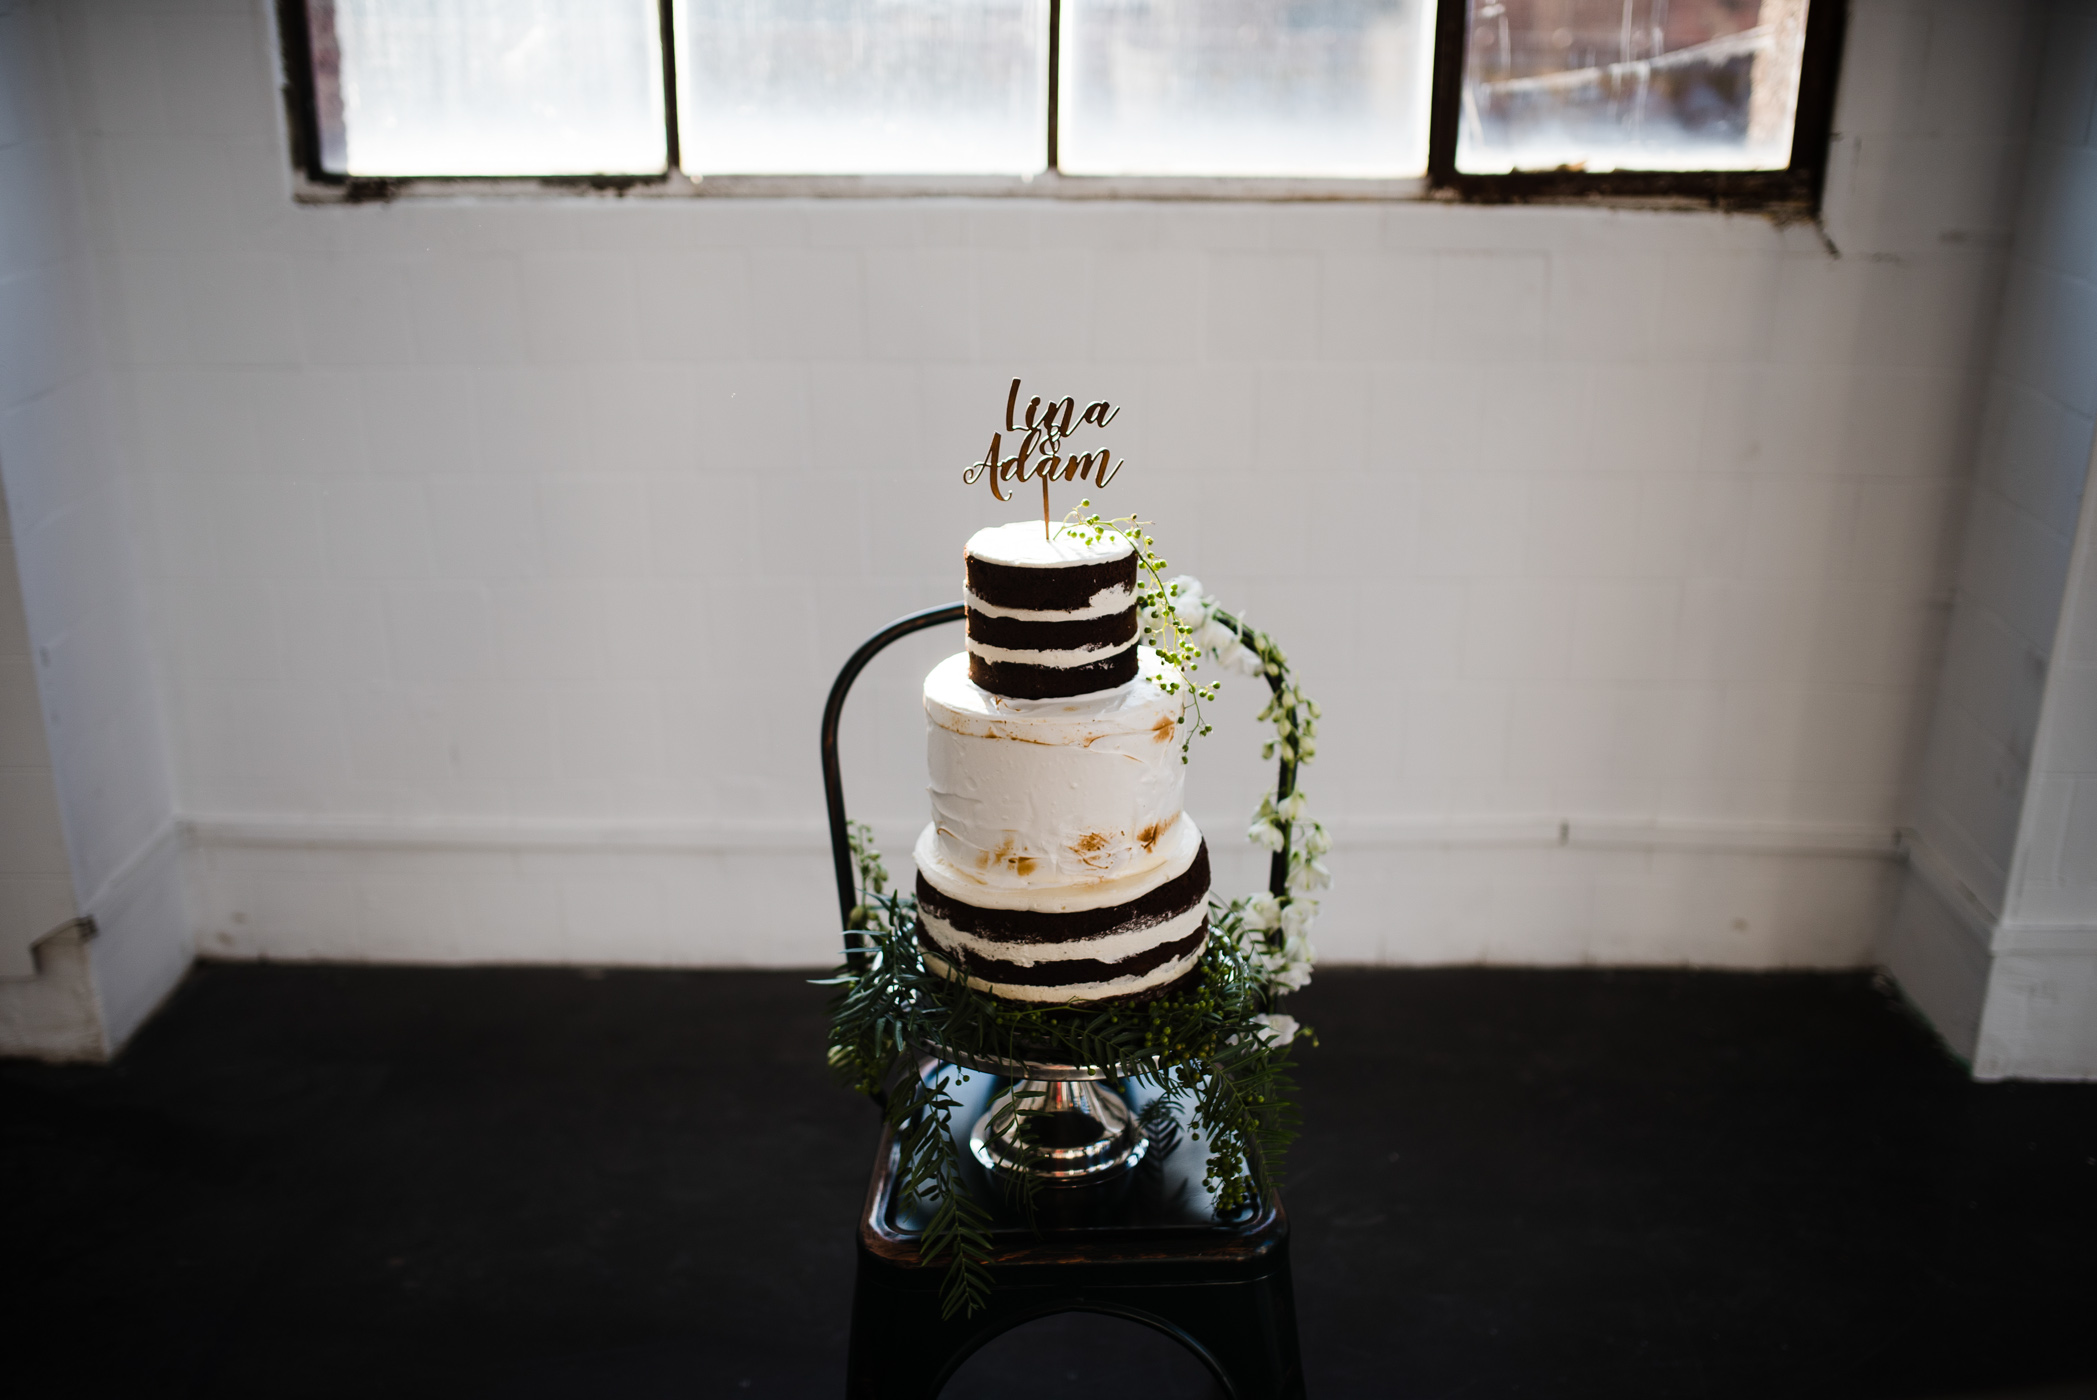 gateau layercake avec cake topper prénoms save the date en bois mariage industriel